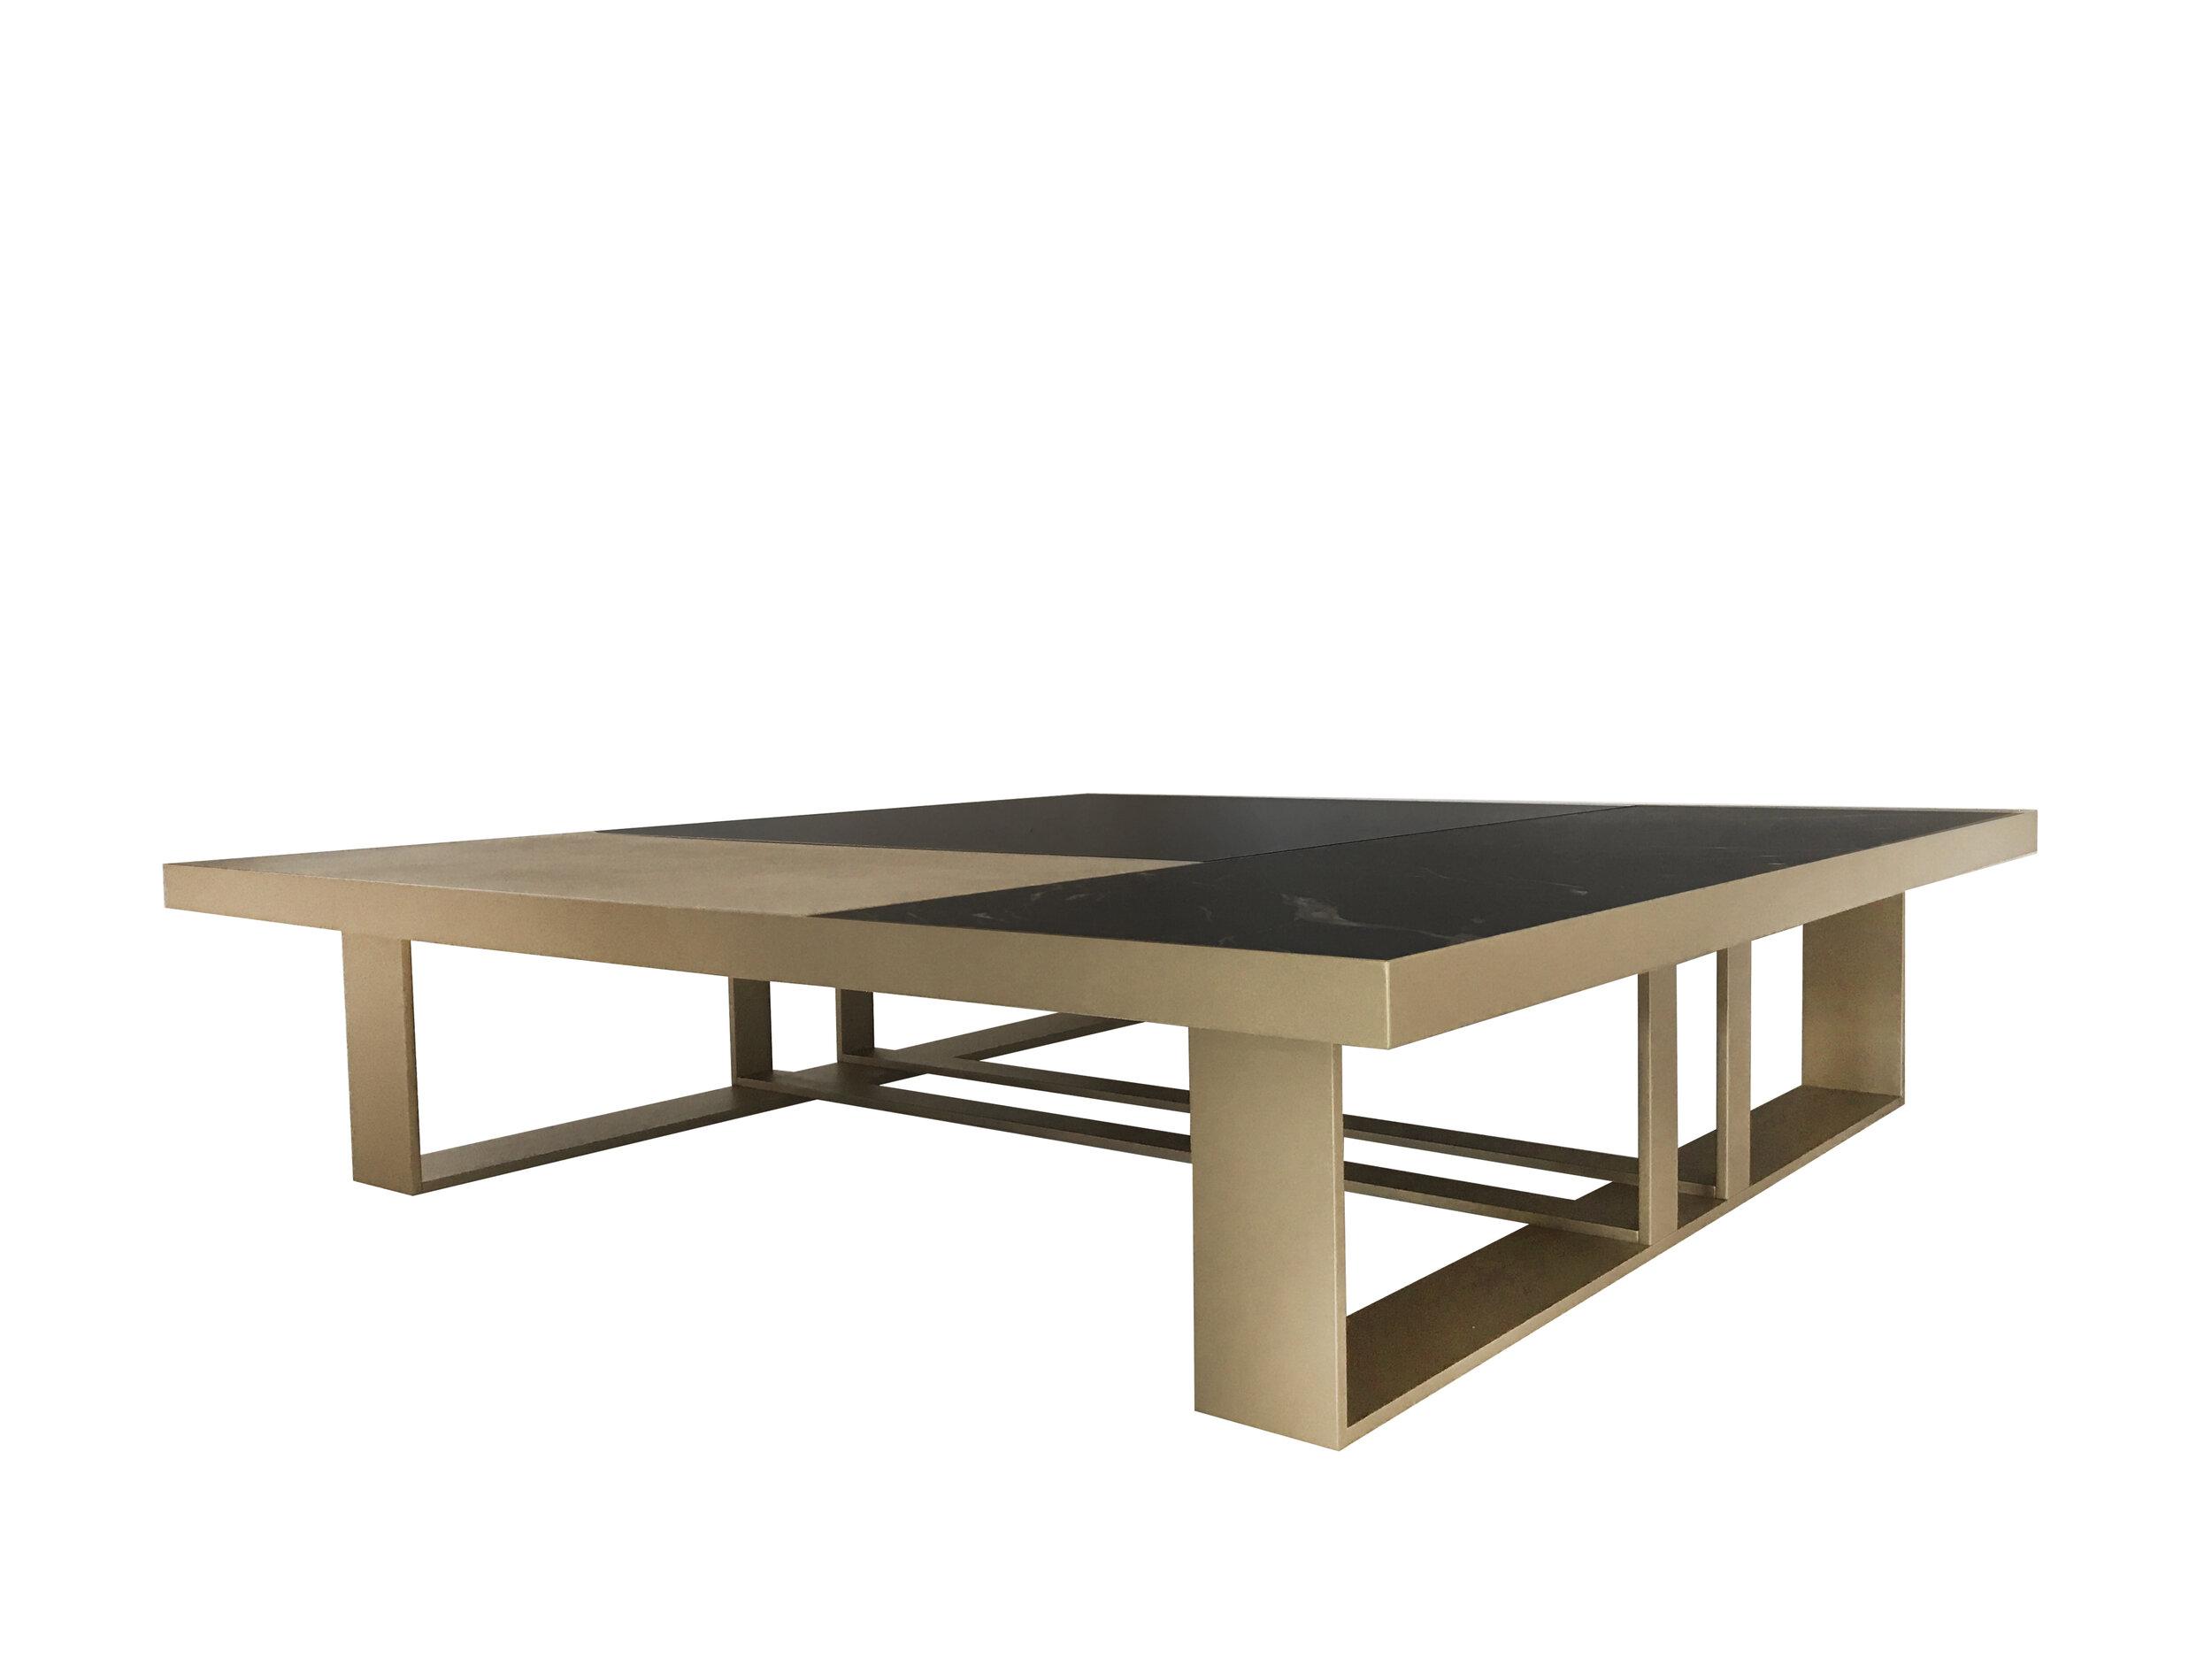 013.TABLE.01.jpg